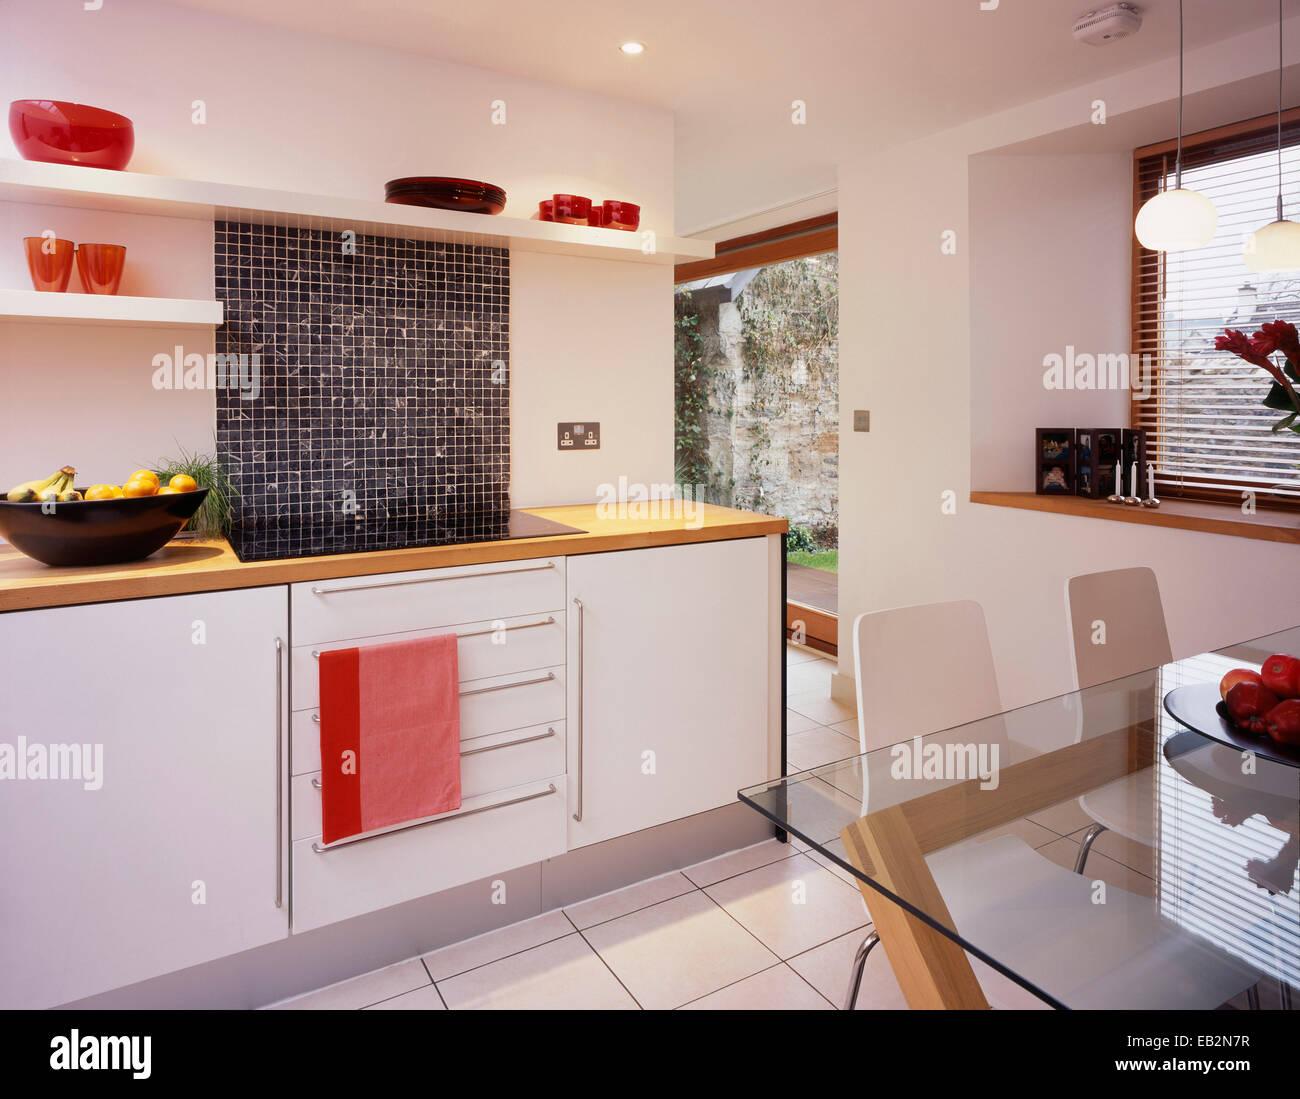 White modern kitchen in The Grainstore, Perthshire, Scotland - Stock Image